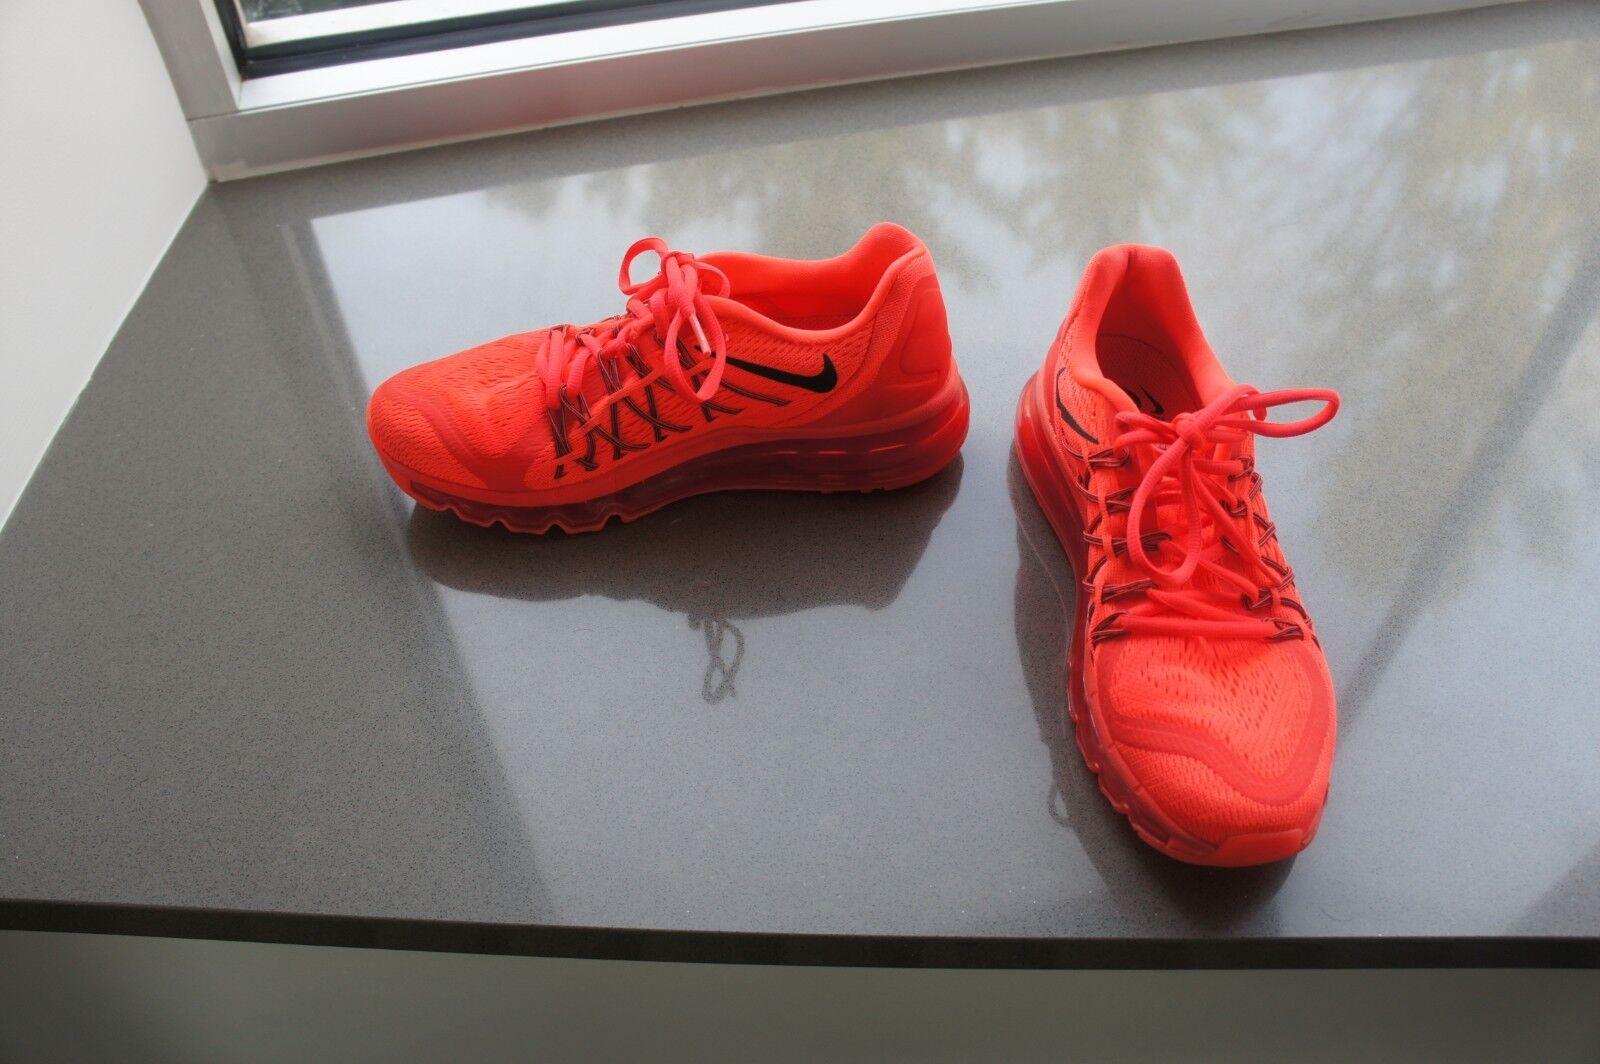 Nike Air Max 2015 Anniversary Pack Bright Crimson Size 7.5 7.5 7.5 726454-600 39c44e